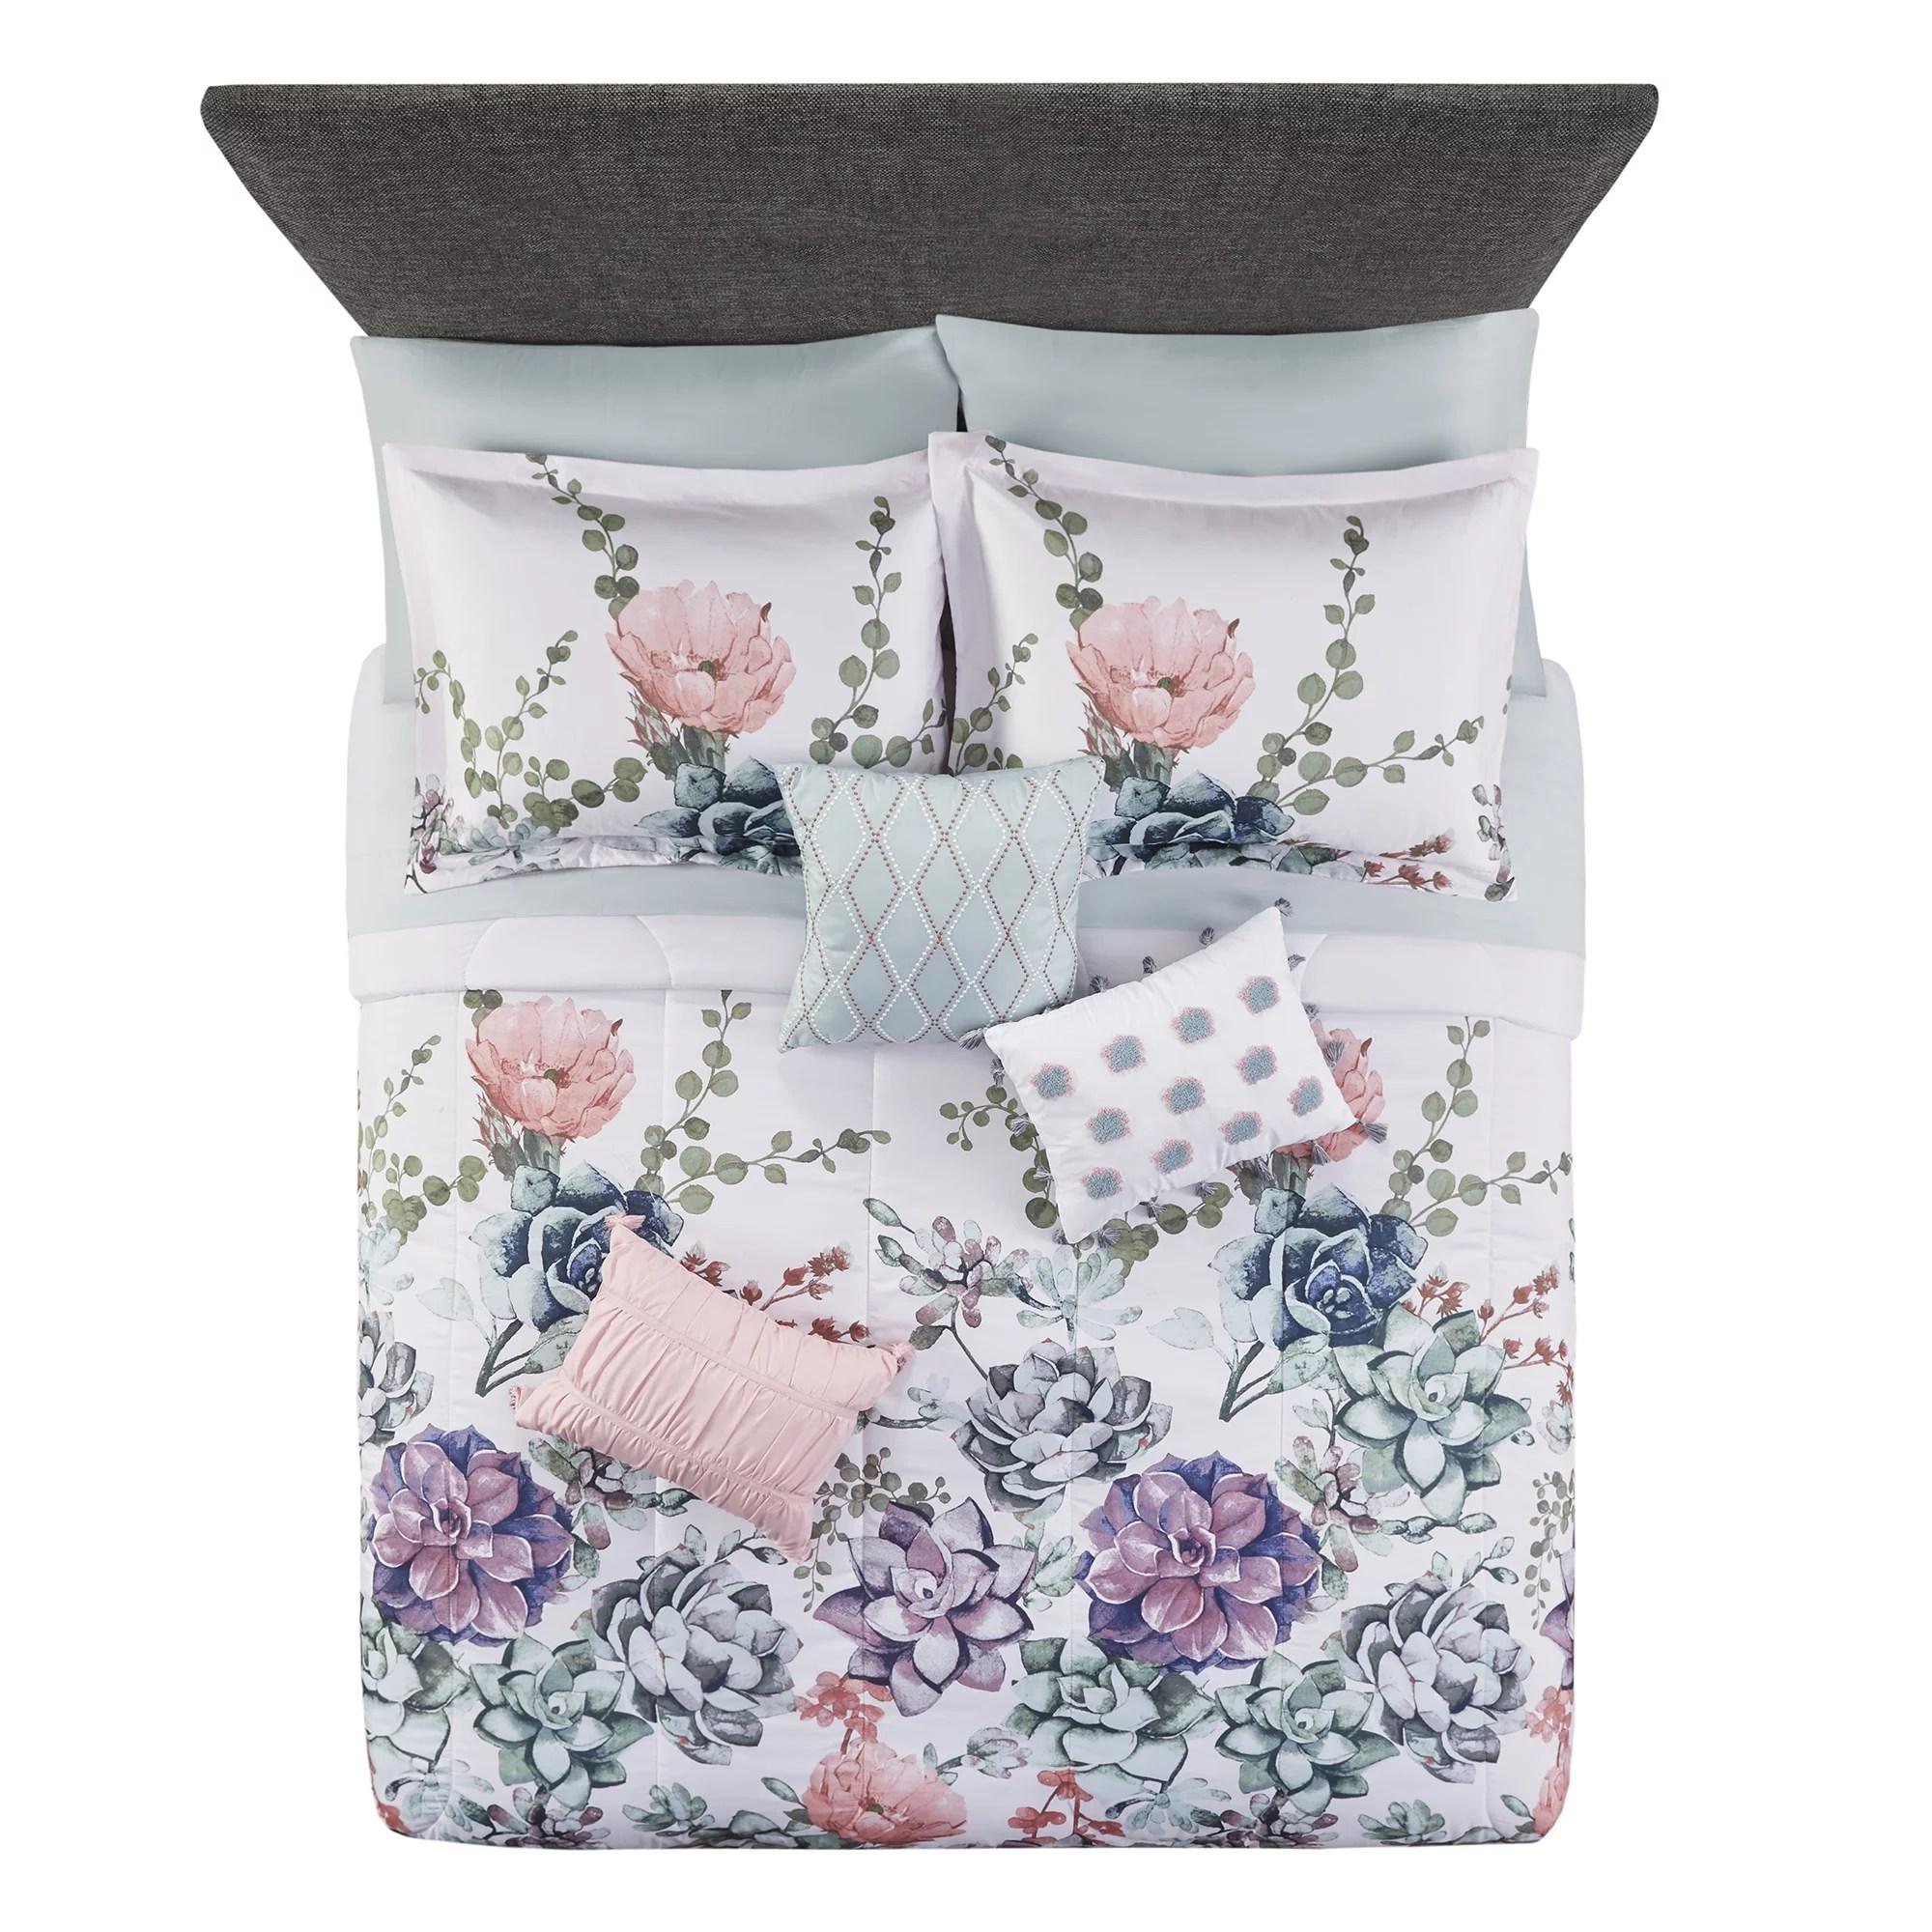 mainstays jade floral 10 piece bed in a bag bedding set w bonus sheet set pillows king